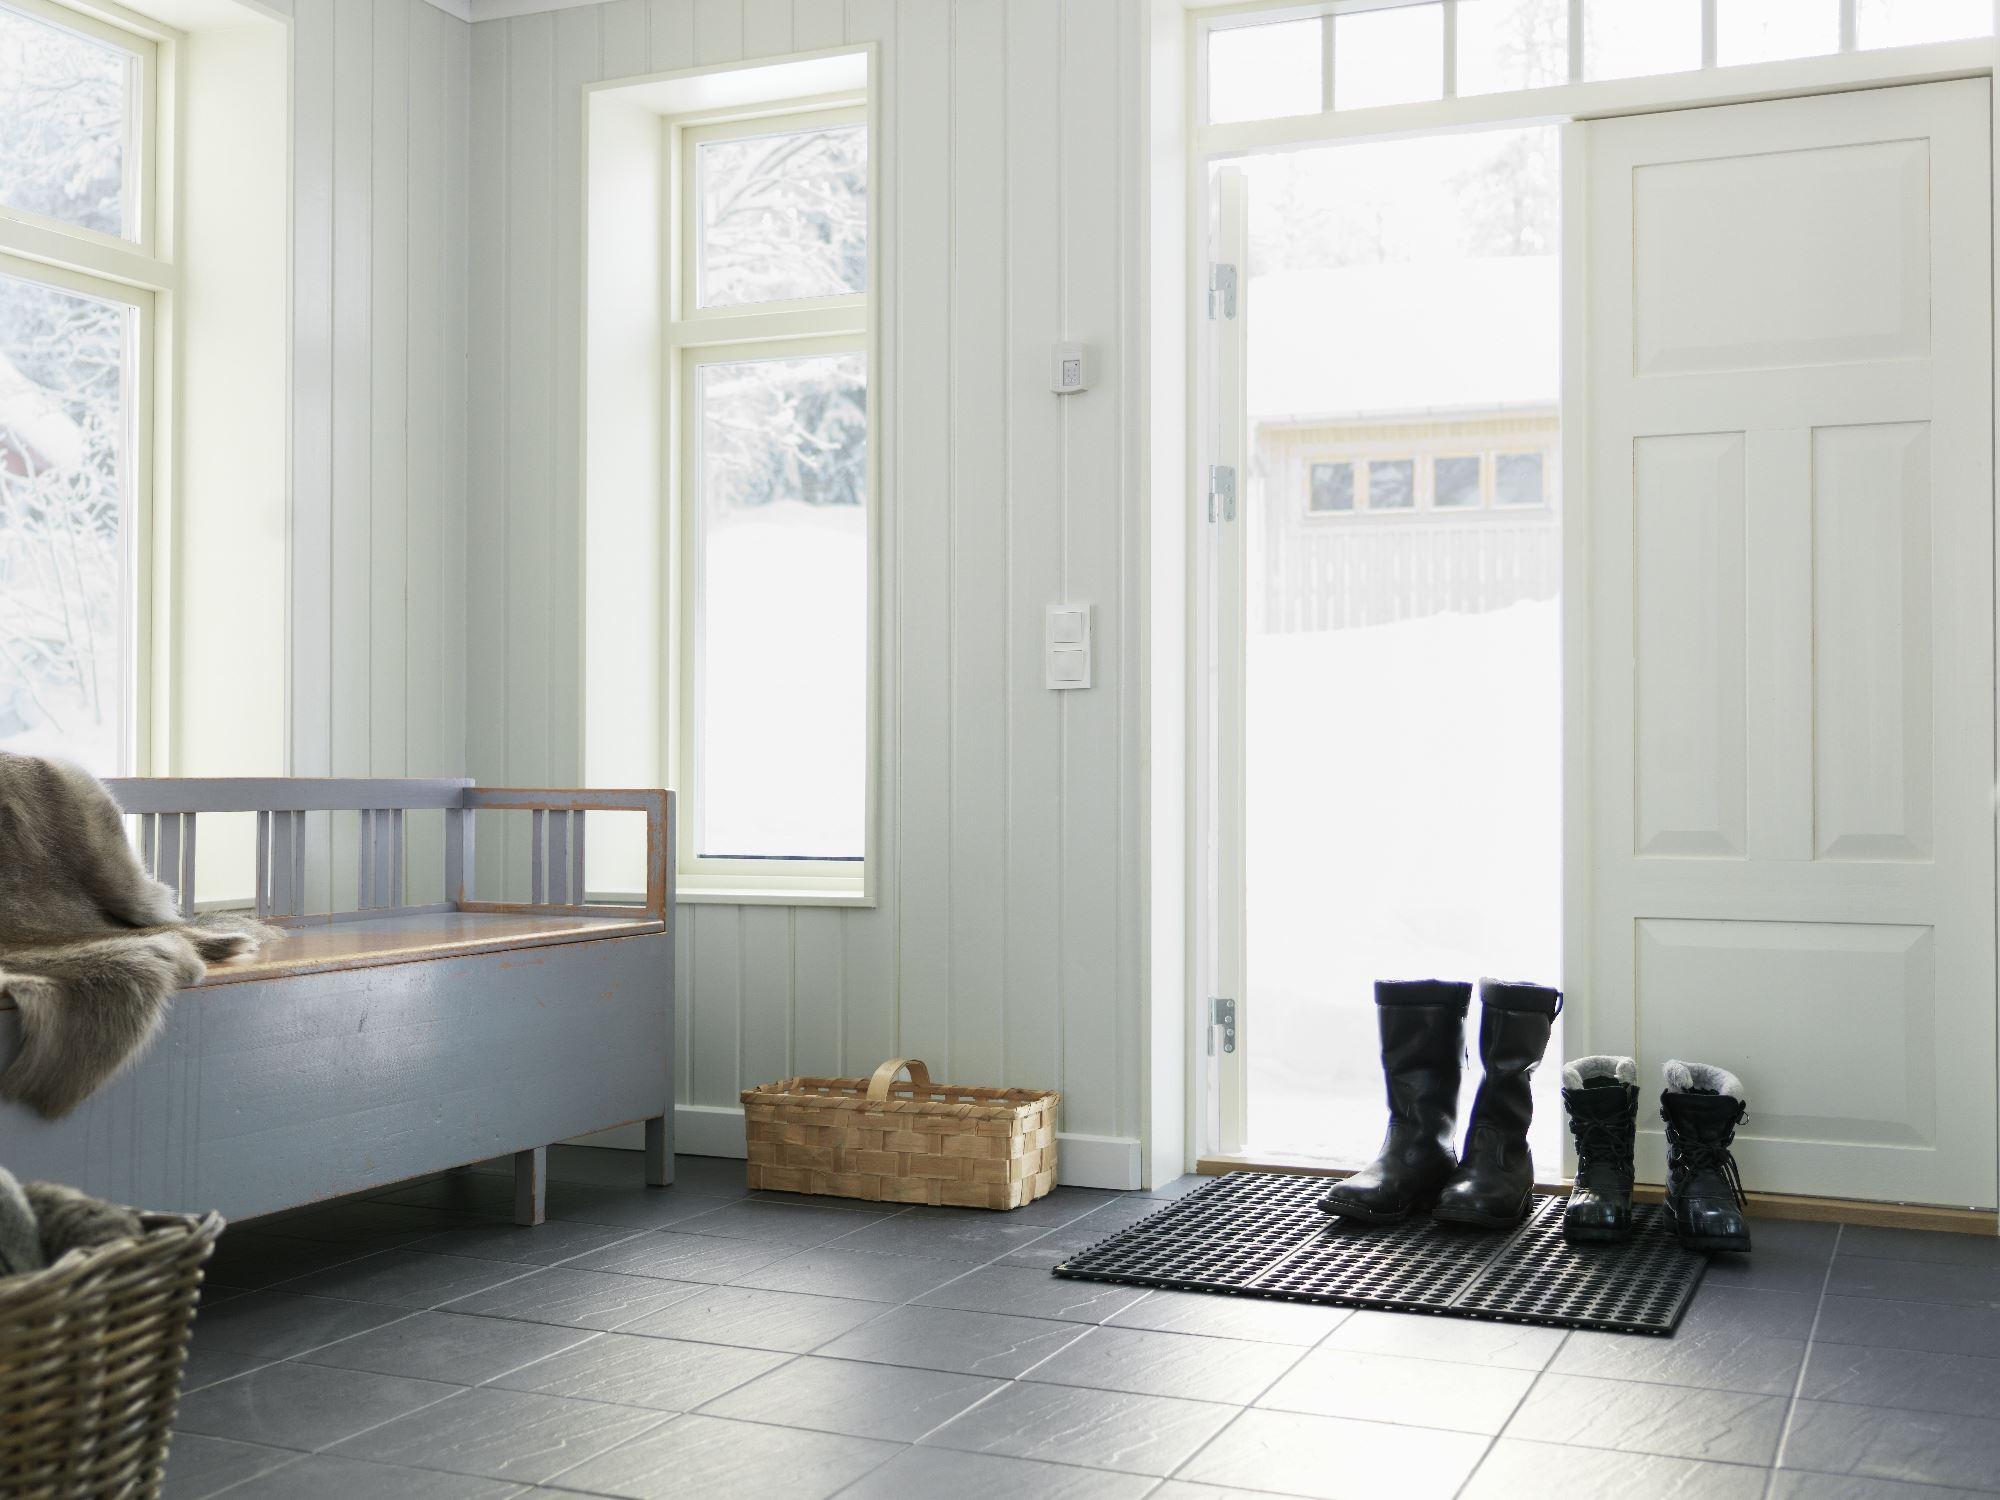 Guest House Tornedalen